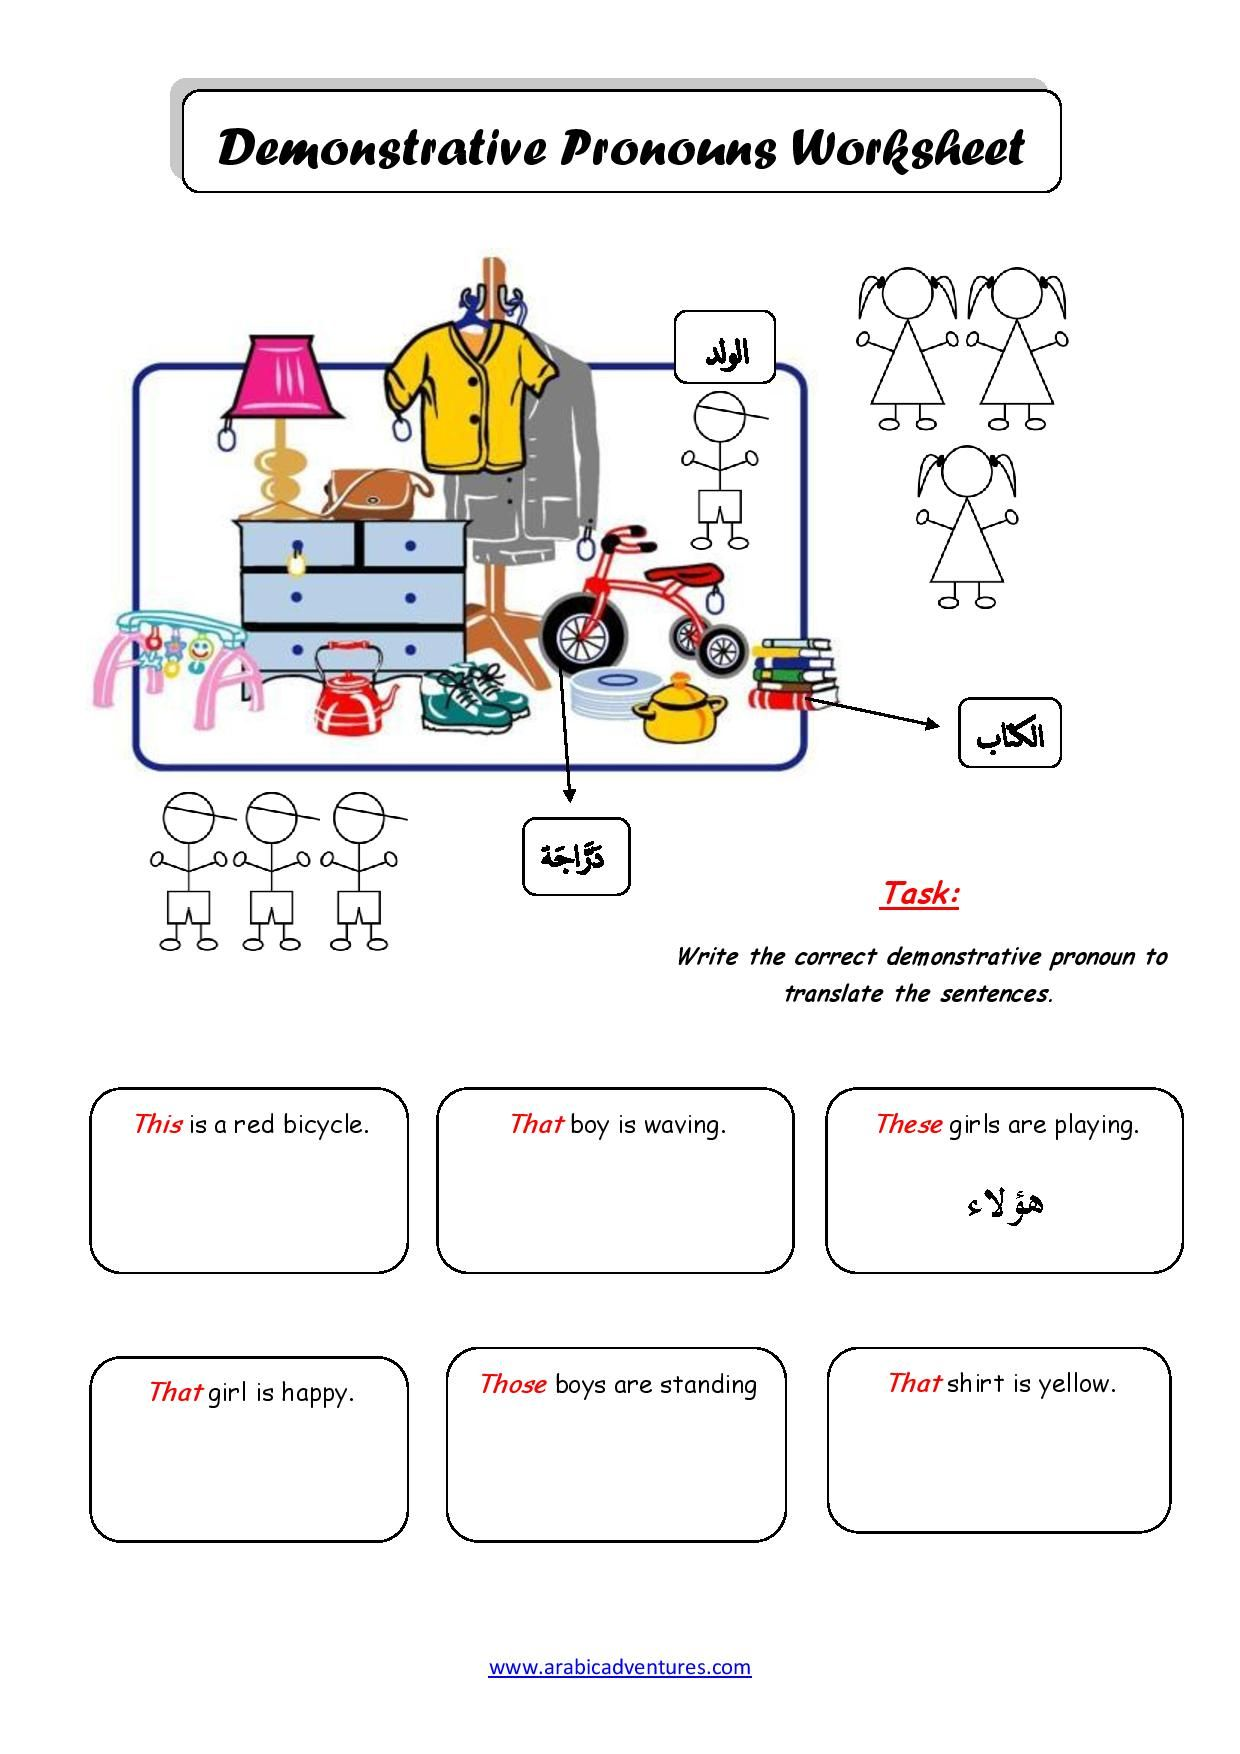 Arabic Demonstrative Pronoun Worksheet Free Printable At Www Arabicadventures Com Com Imagens